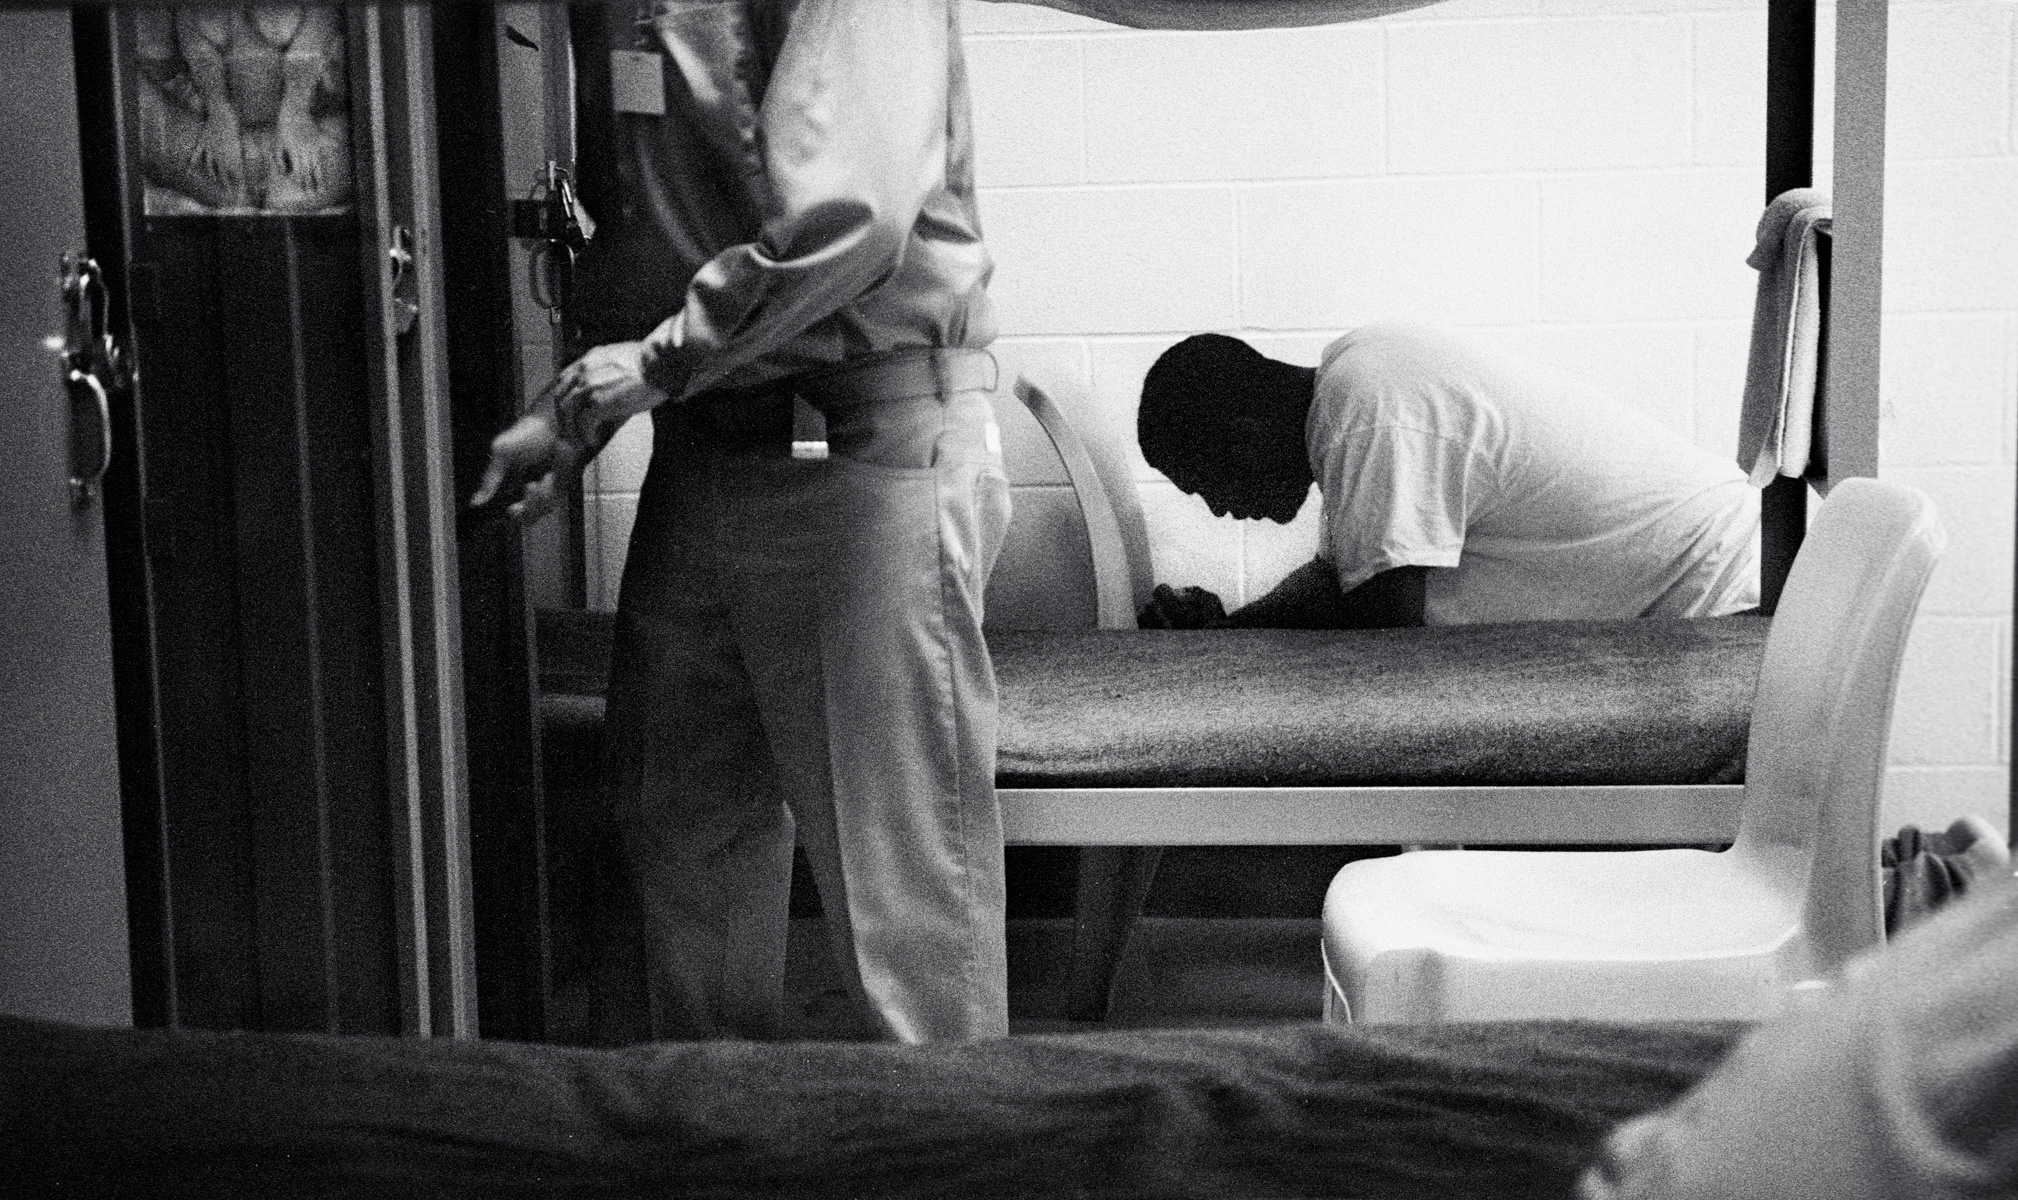 prison-prayer-cell-1.jpg